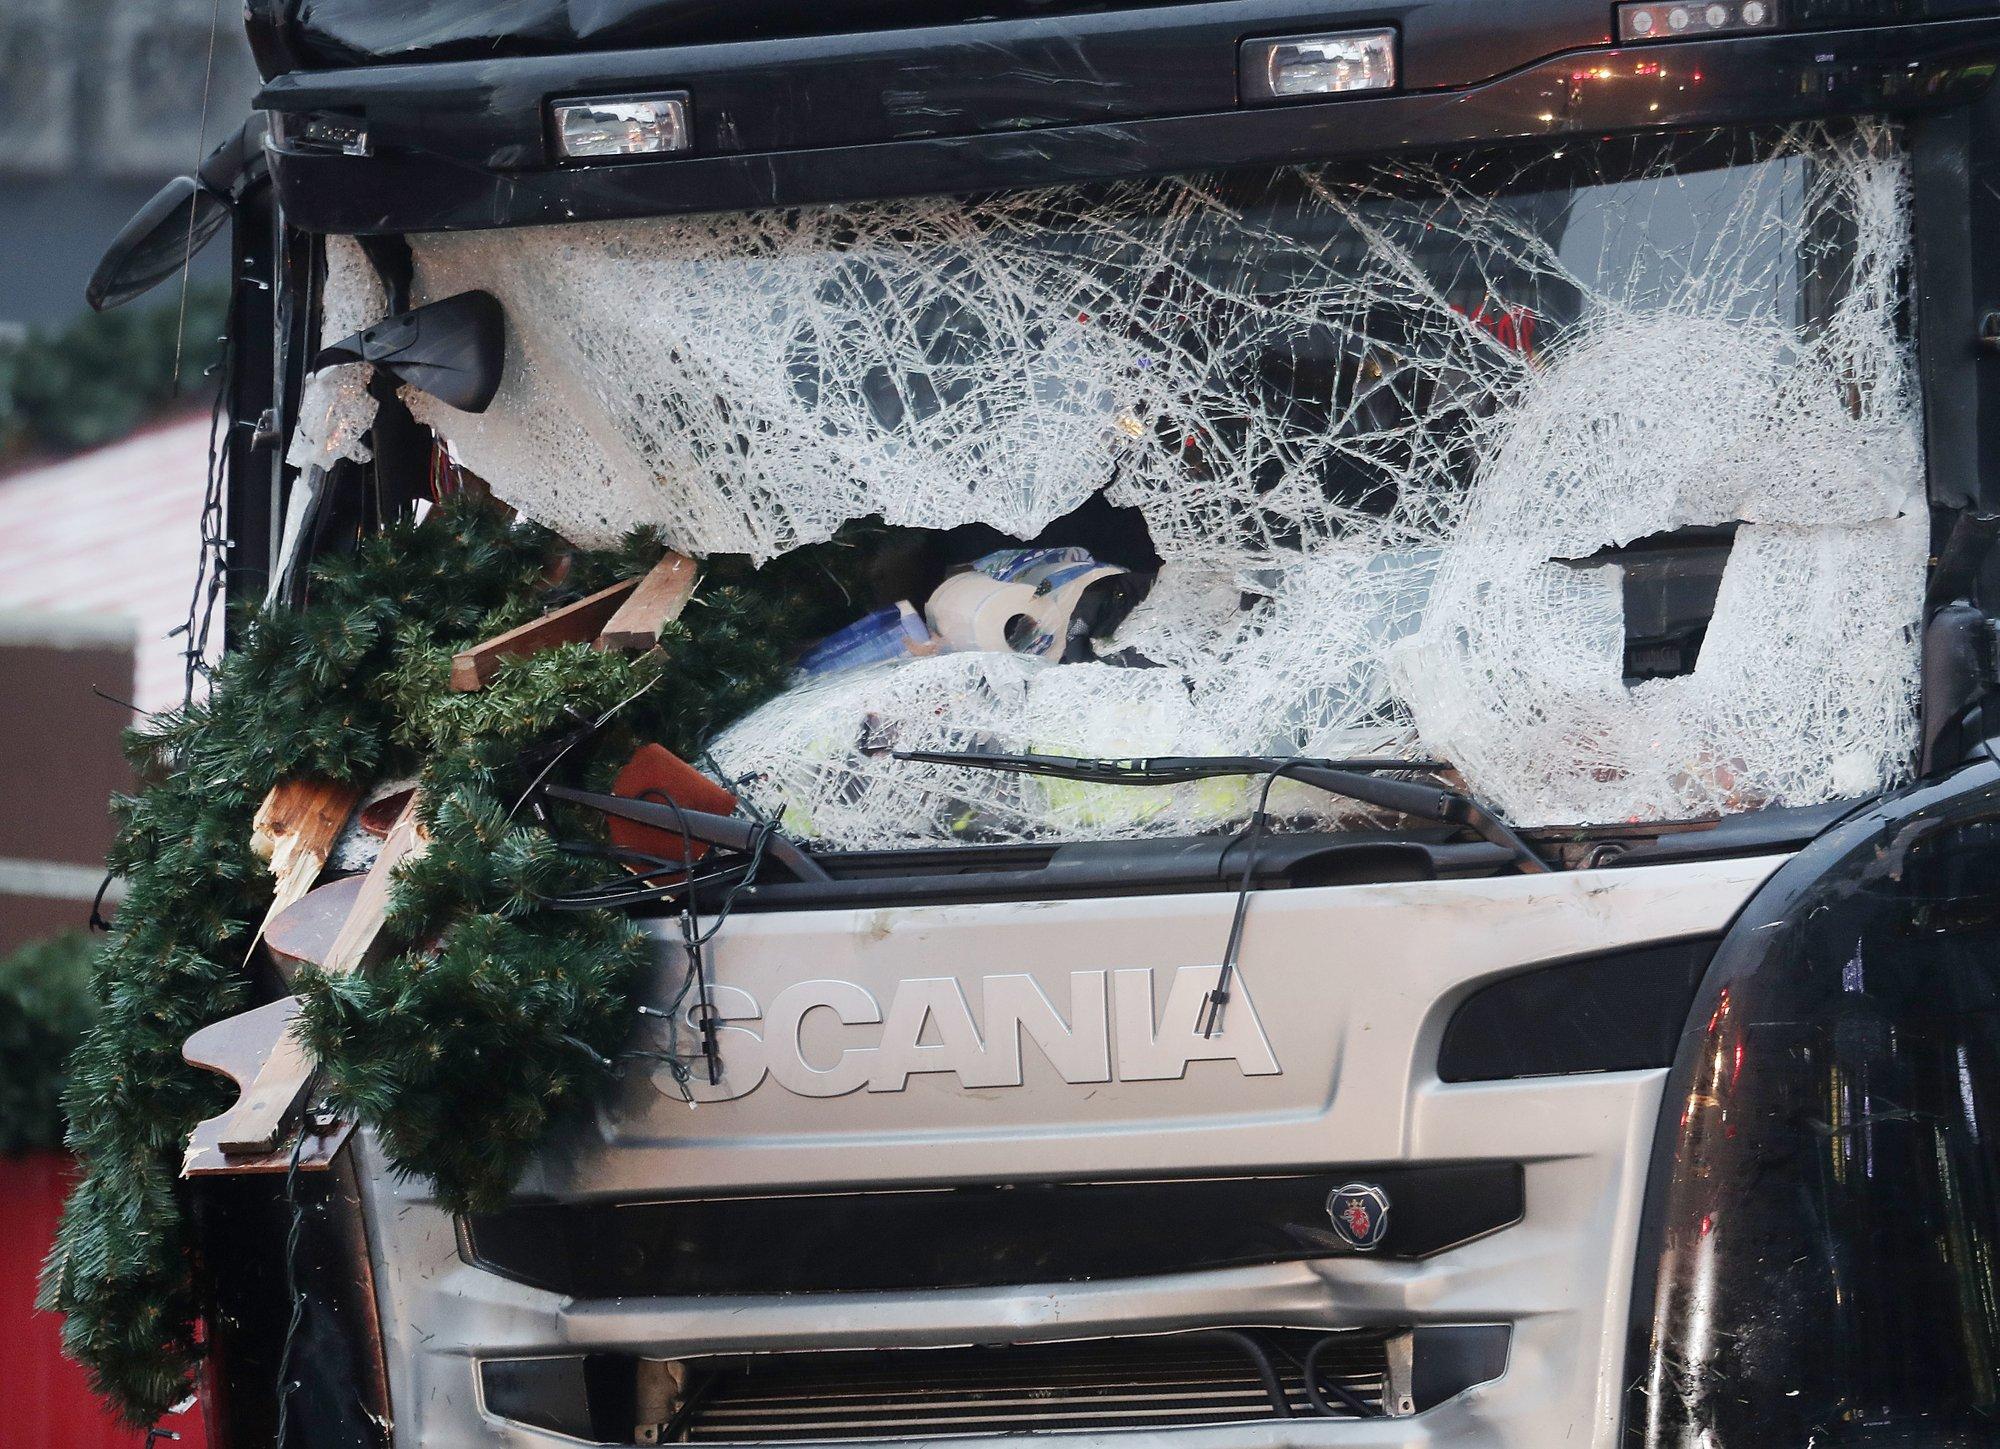 German govt denies cover-up over Berlin Xmas market attack